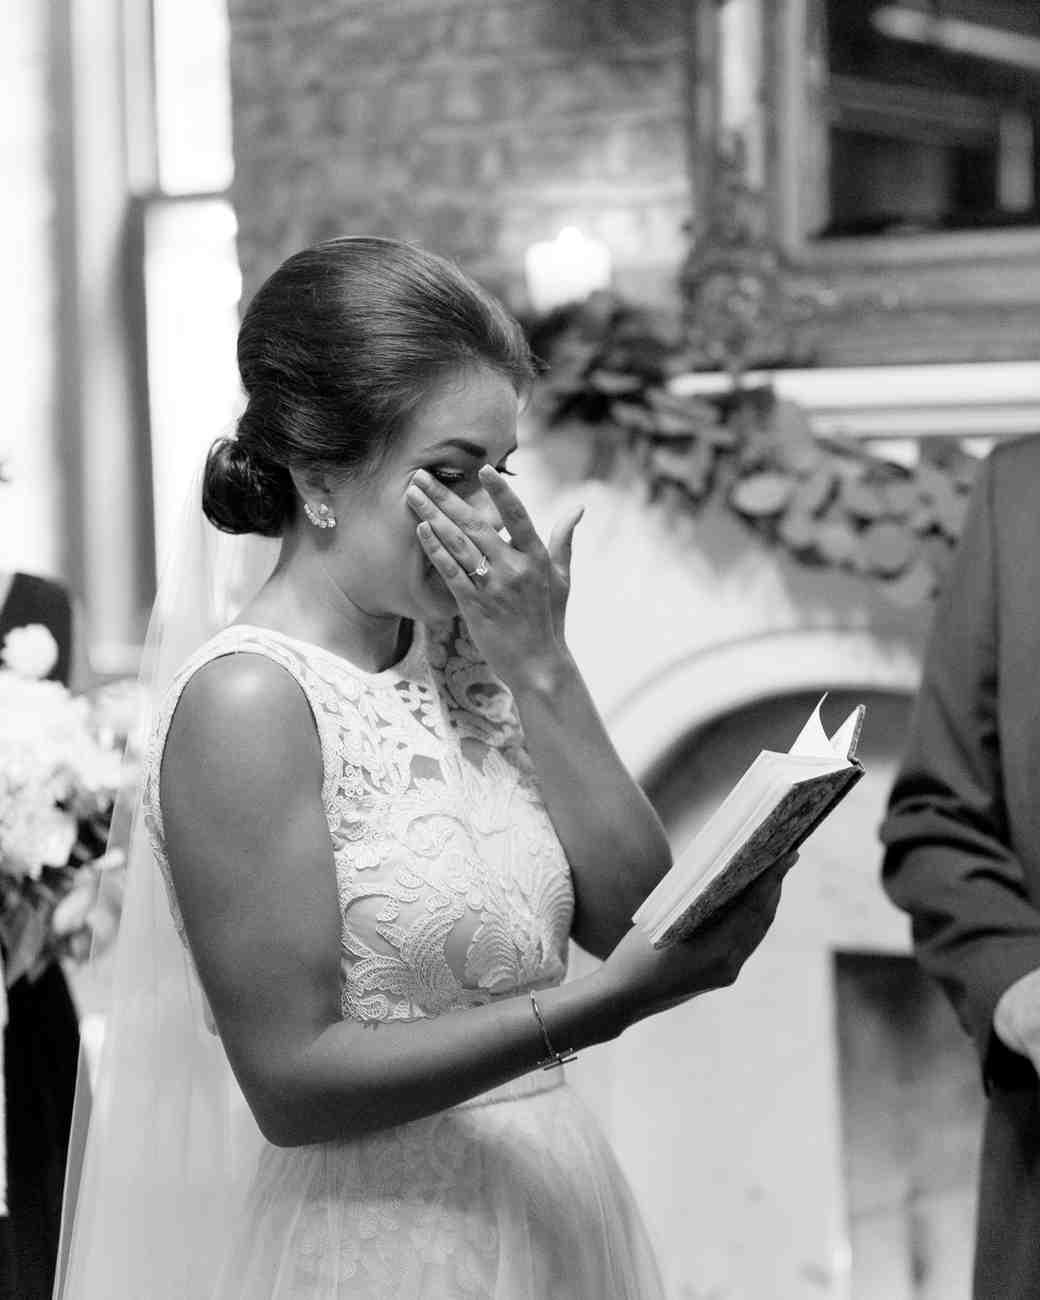 bianca-bryen-wedding-ceremony-259-s112509-0216.jpg